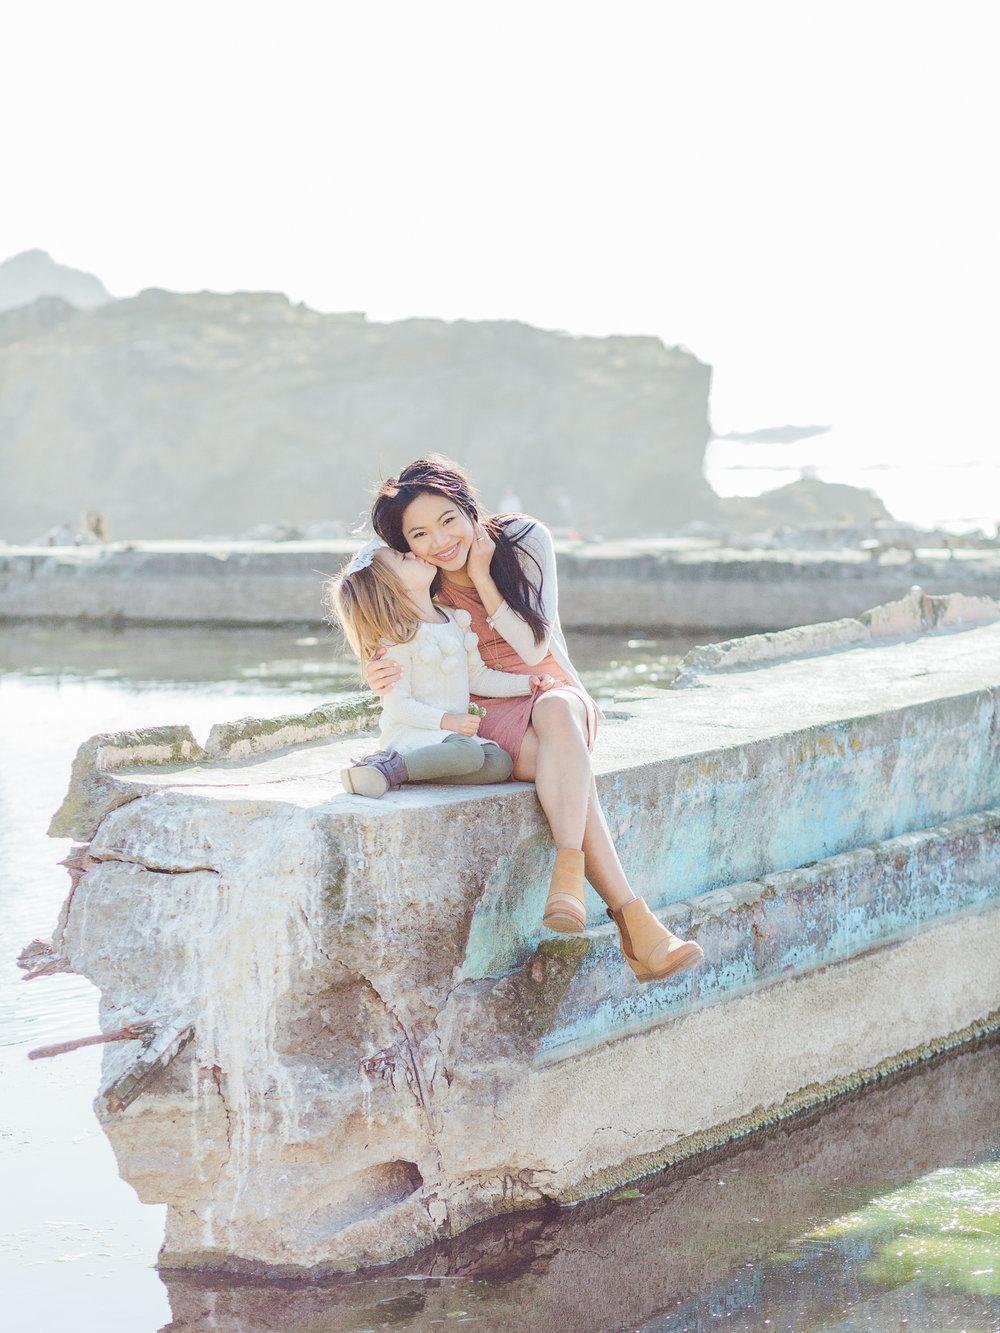 Jenny Soi Photography - Associate Diemmi websize-104.jpg